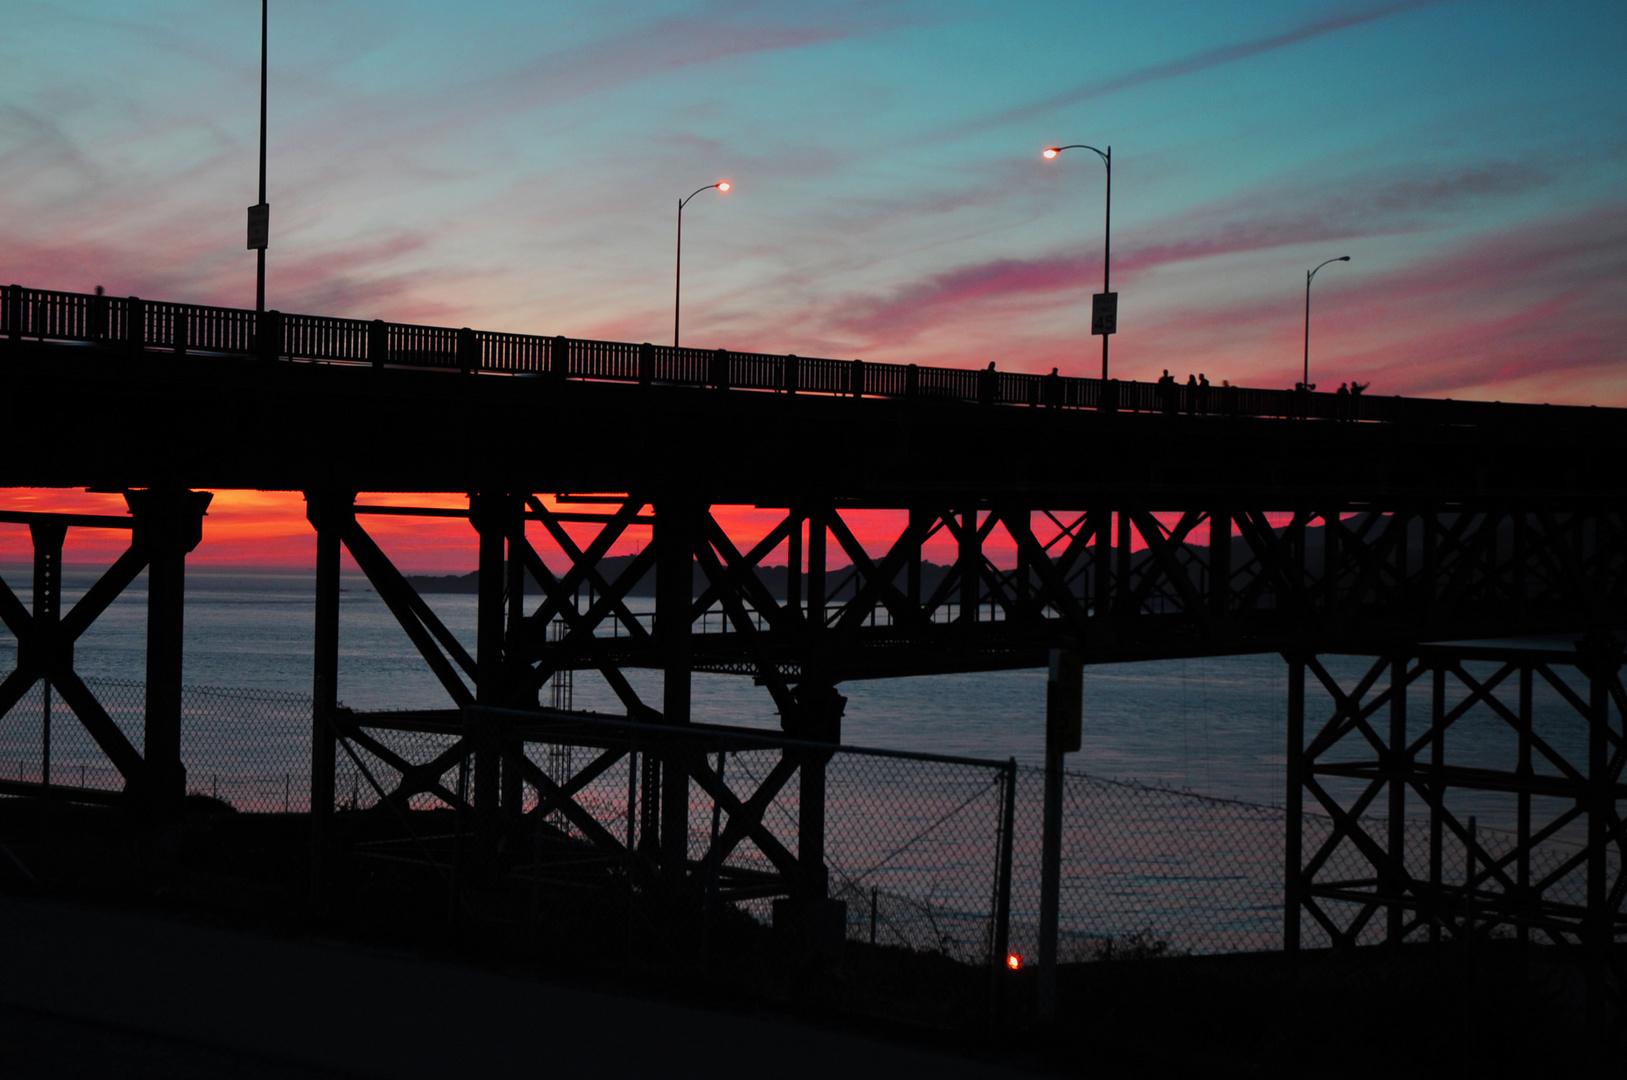 Sunset - SanFrancisco